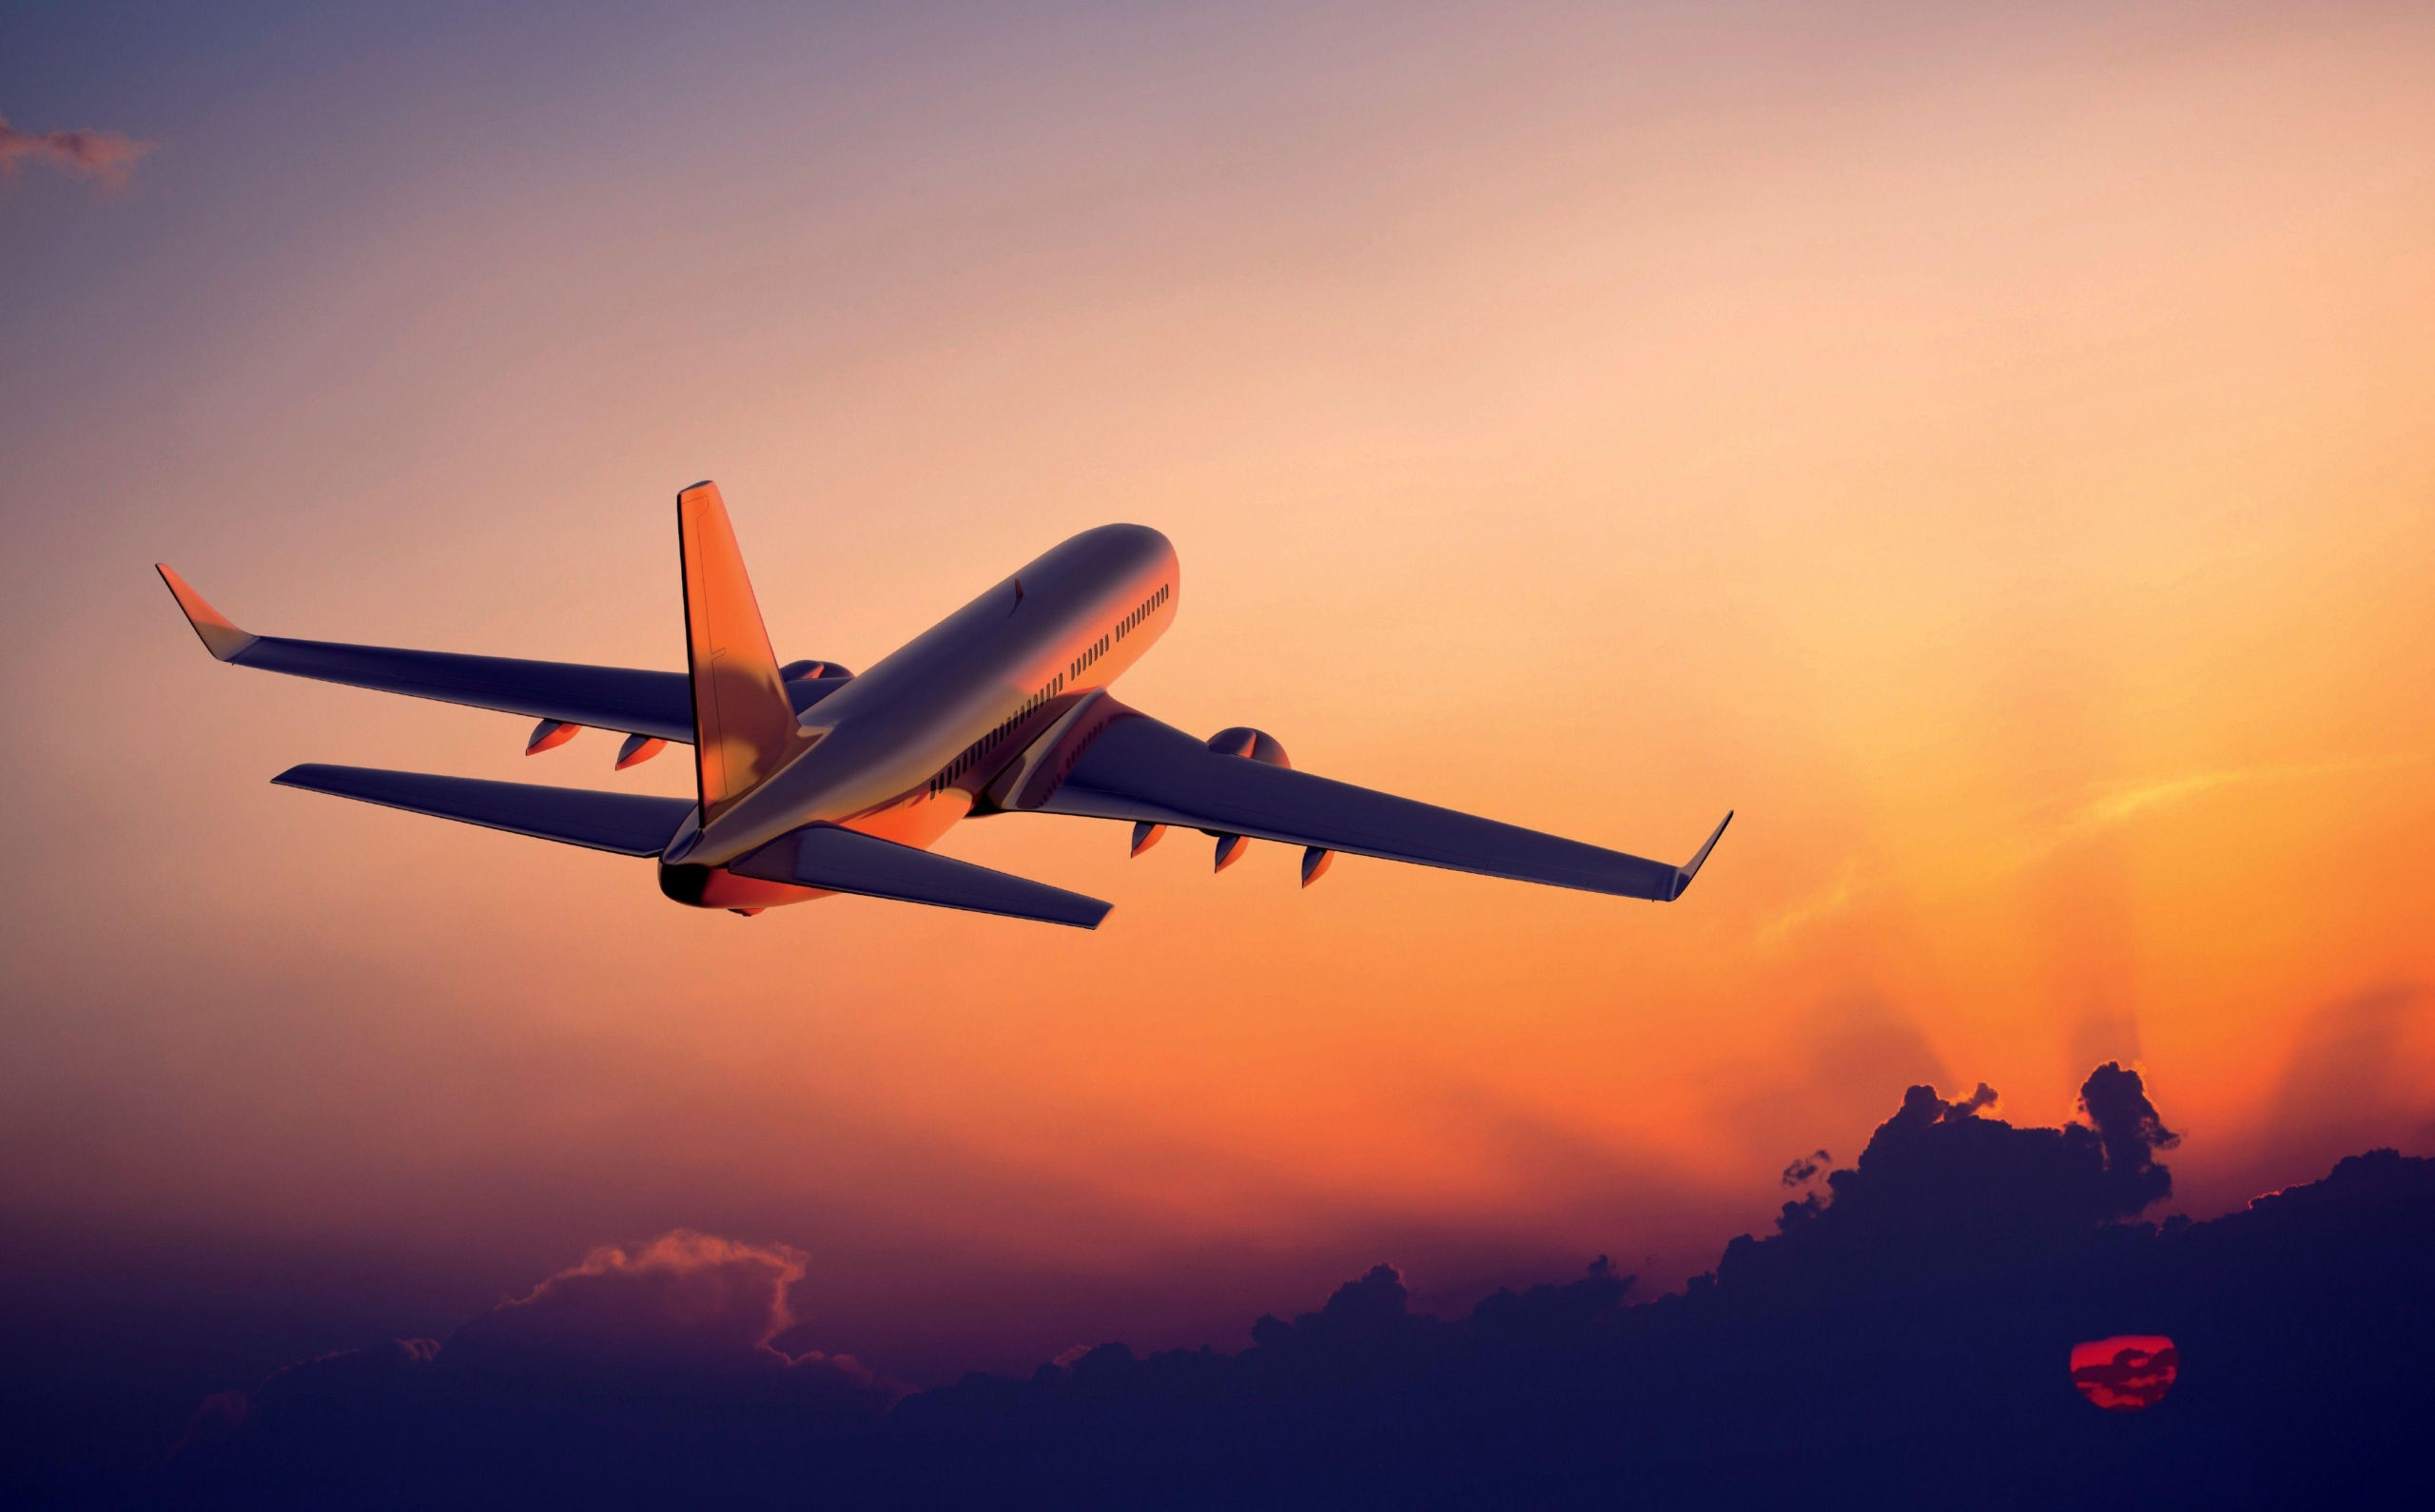 What Are Plane Picture designs?